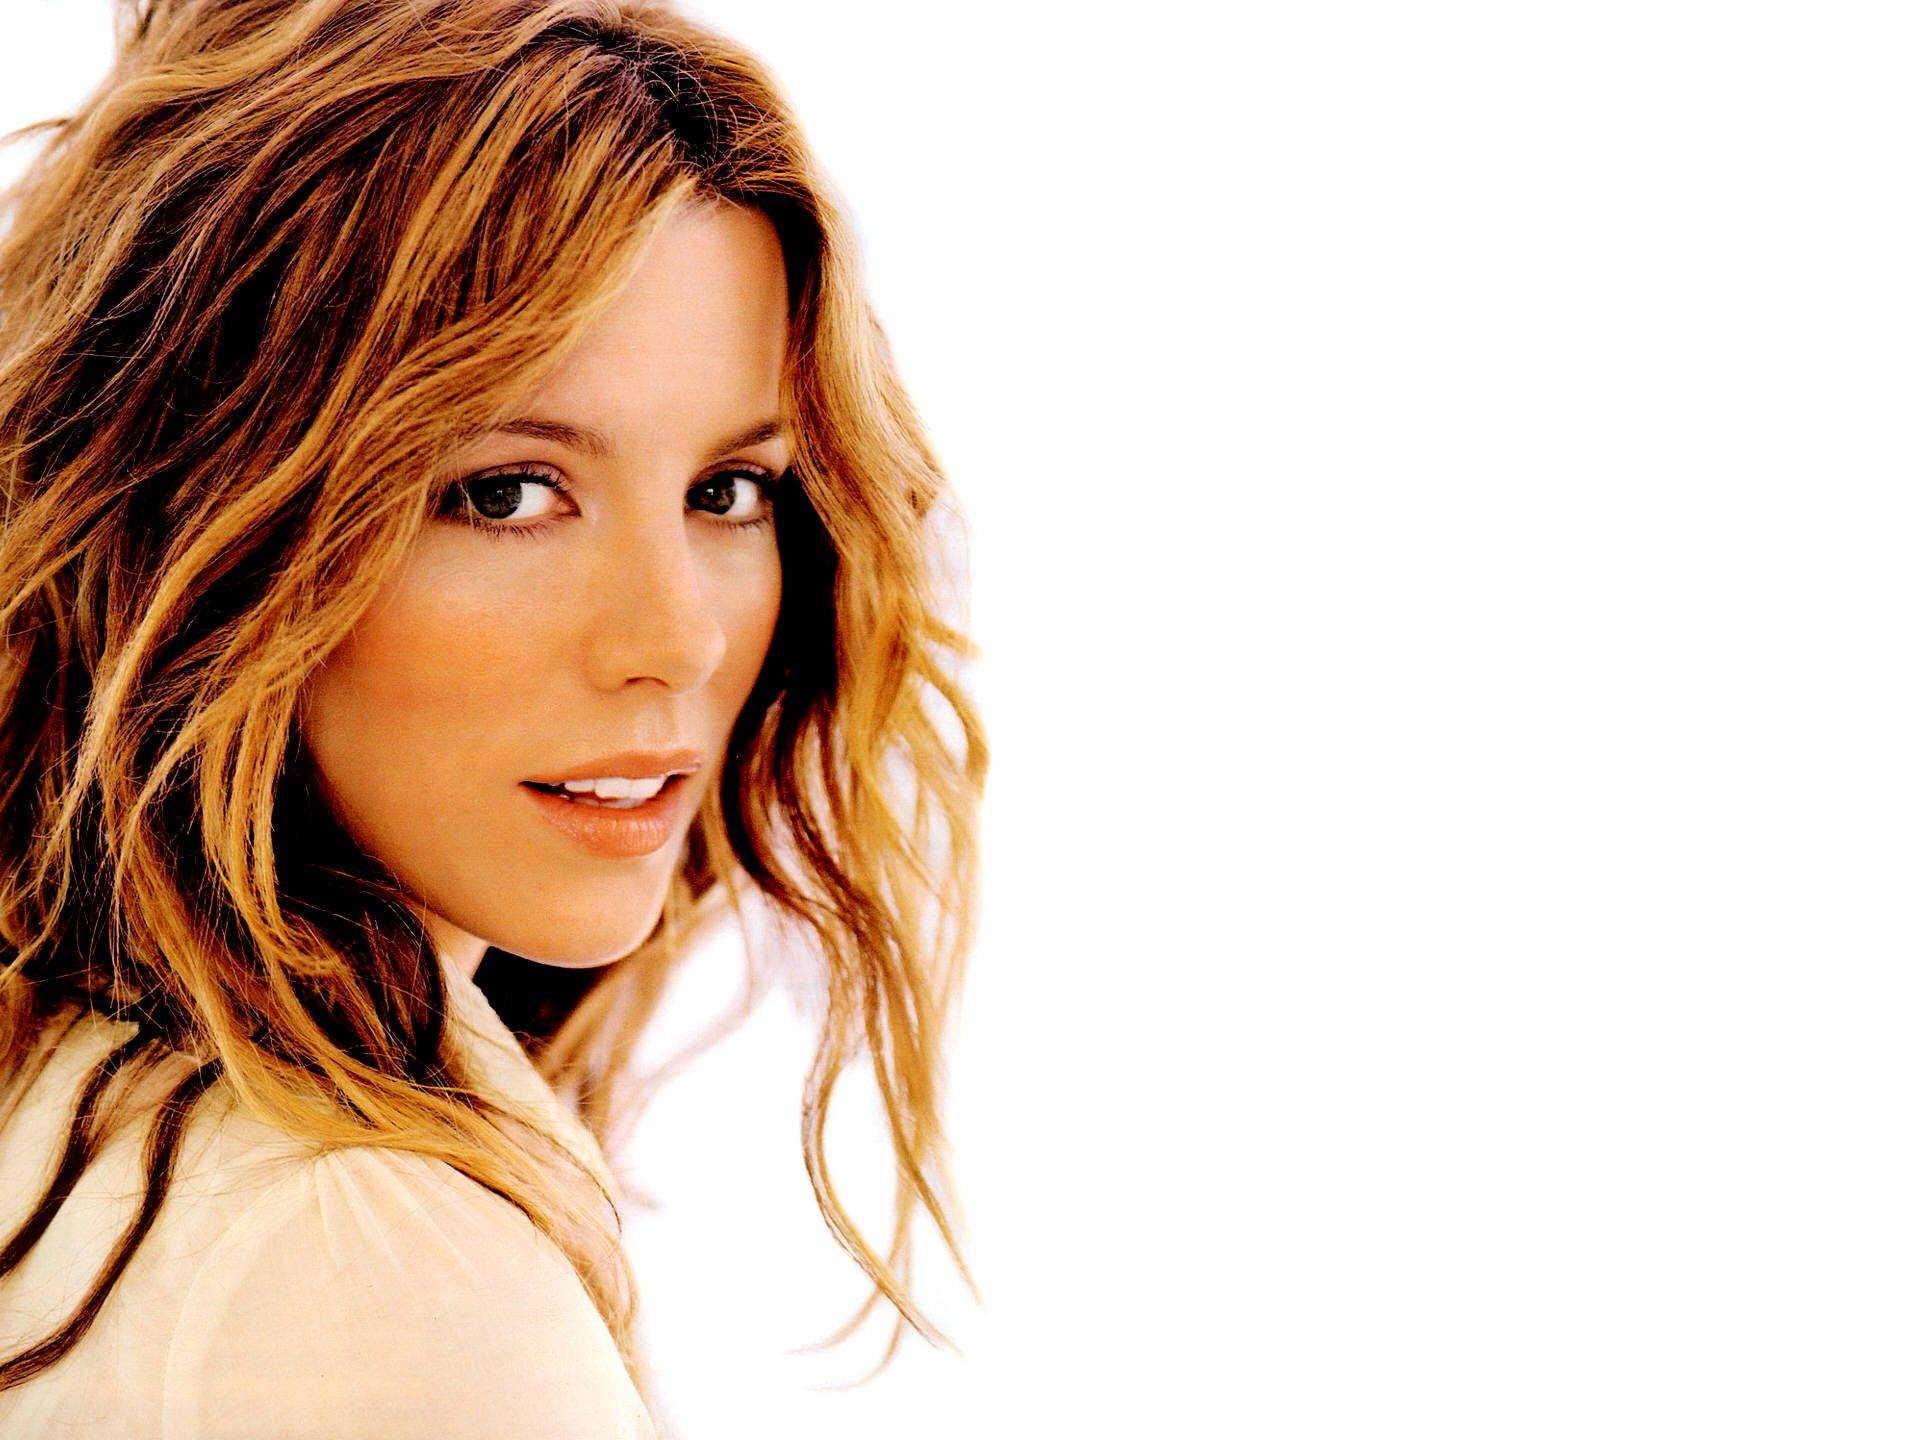 Kate Beckinsale Wallpapers Top Free Kate Beckinsale Backgrounds Wallpaperaccess